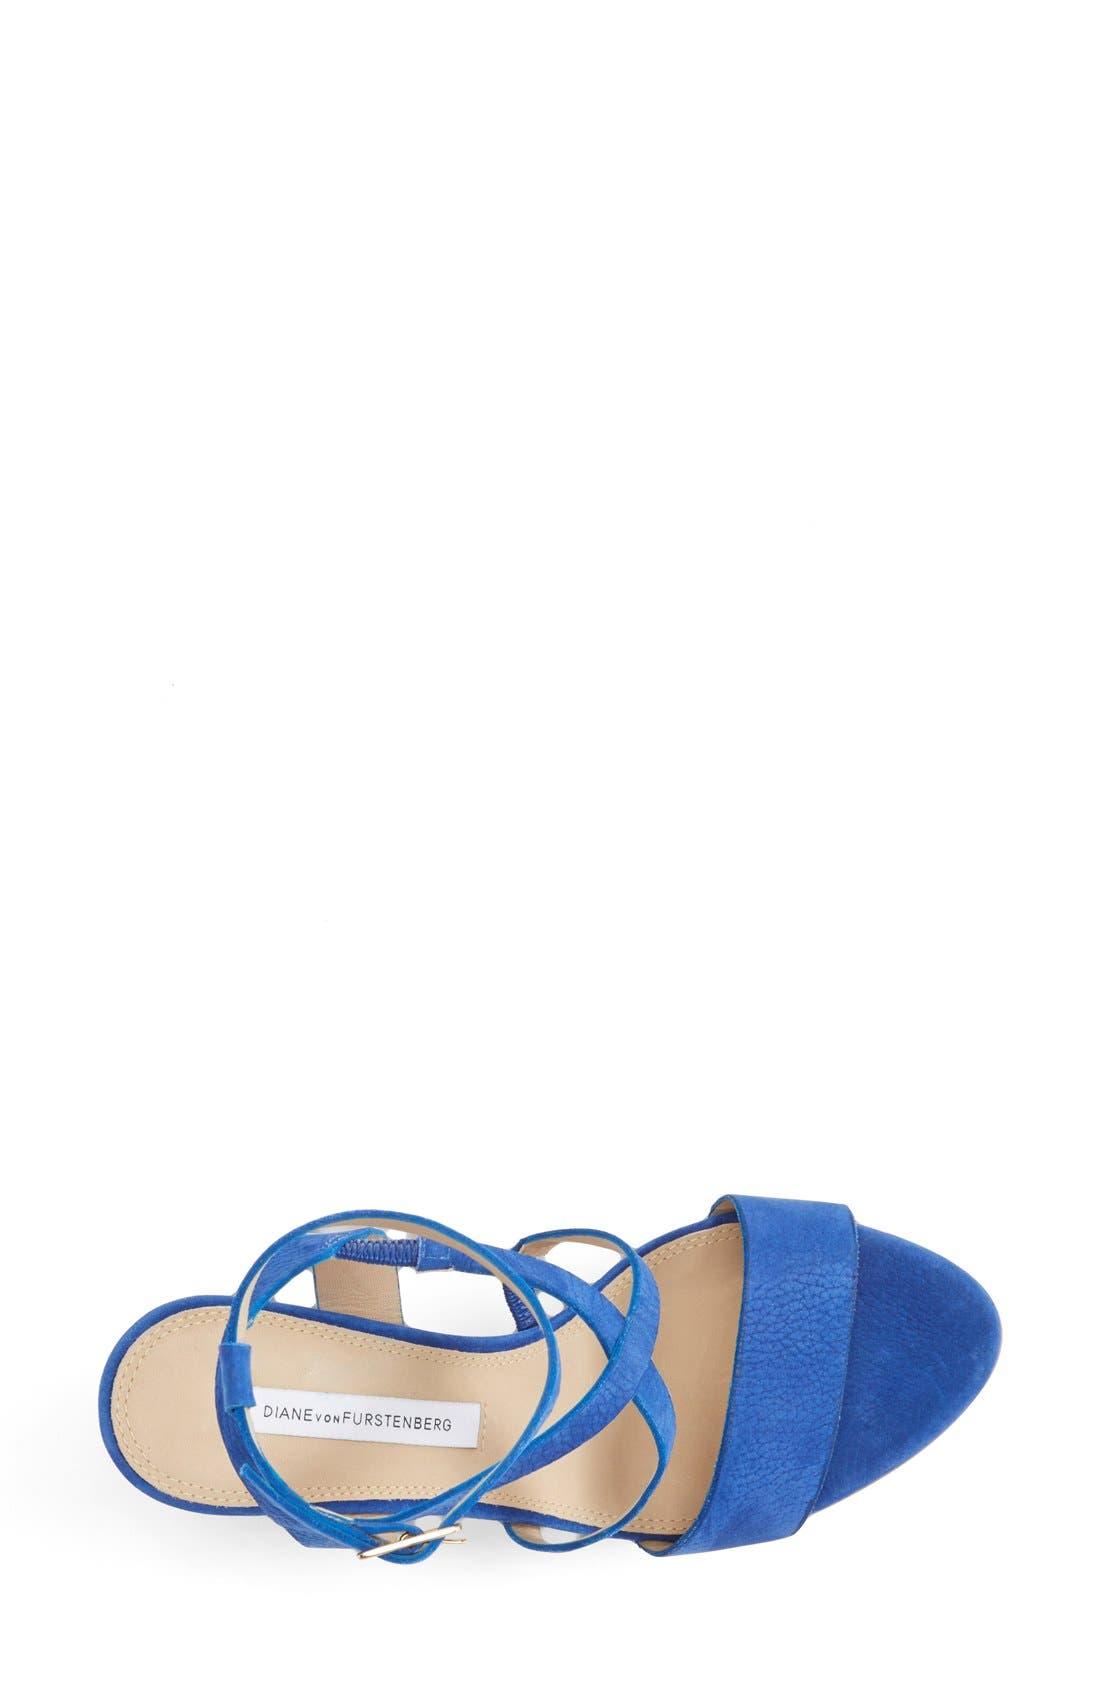 'Lamille' Leather Platform Wedge Sandal,                             Alternate thumbnail 3, color,                             Blue Riviera